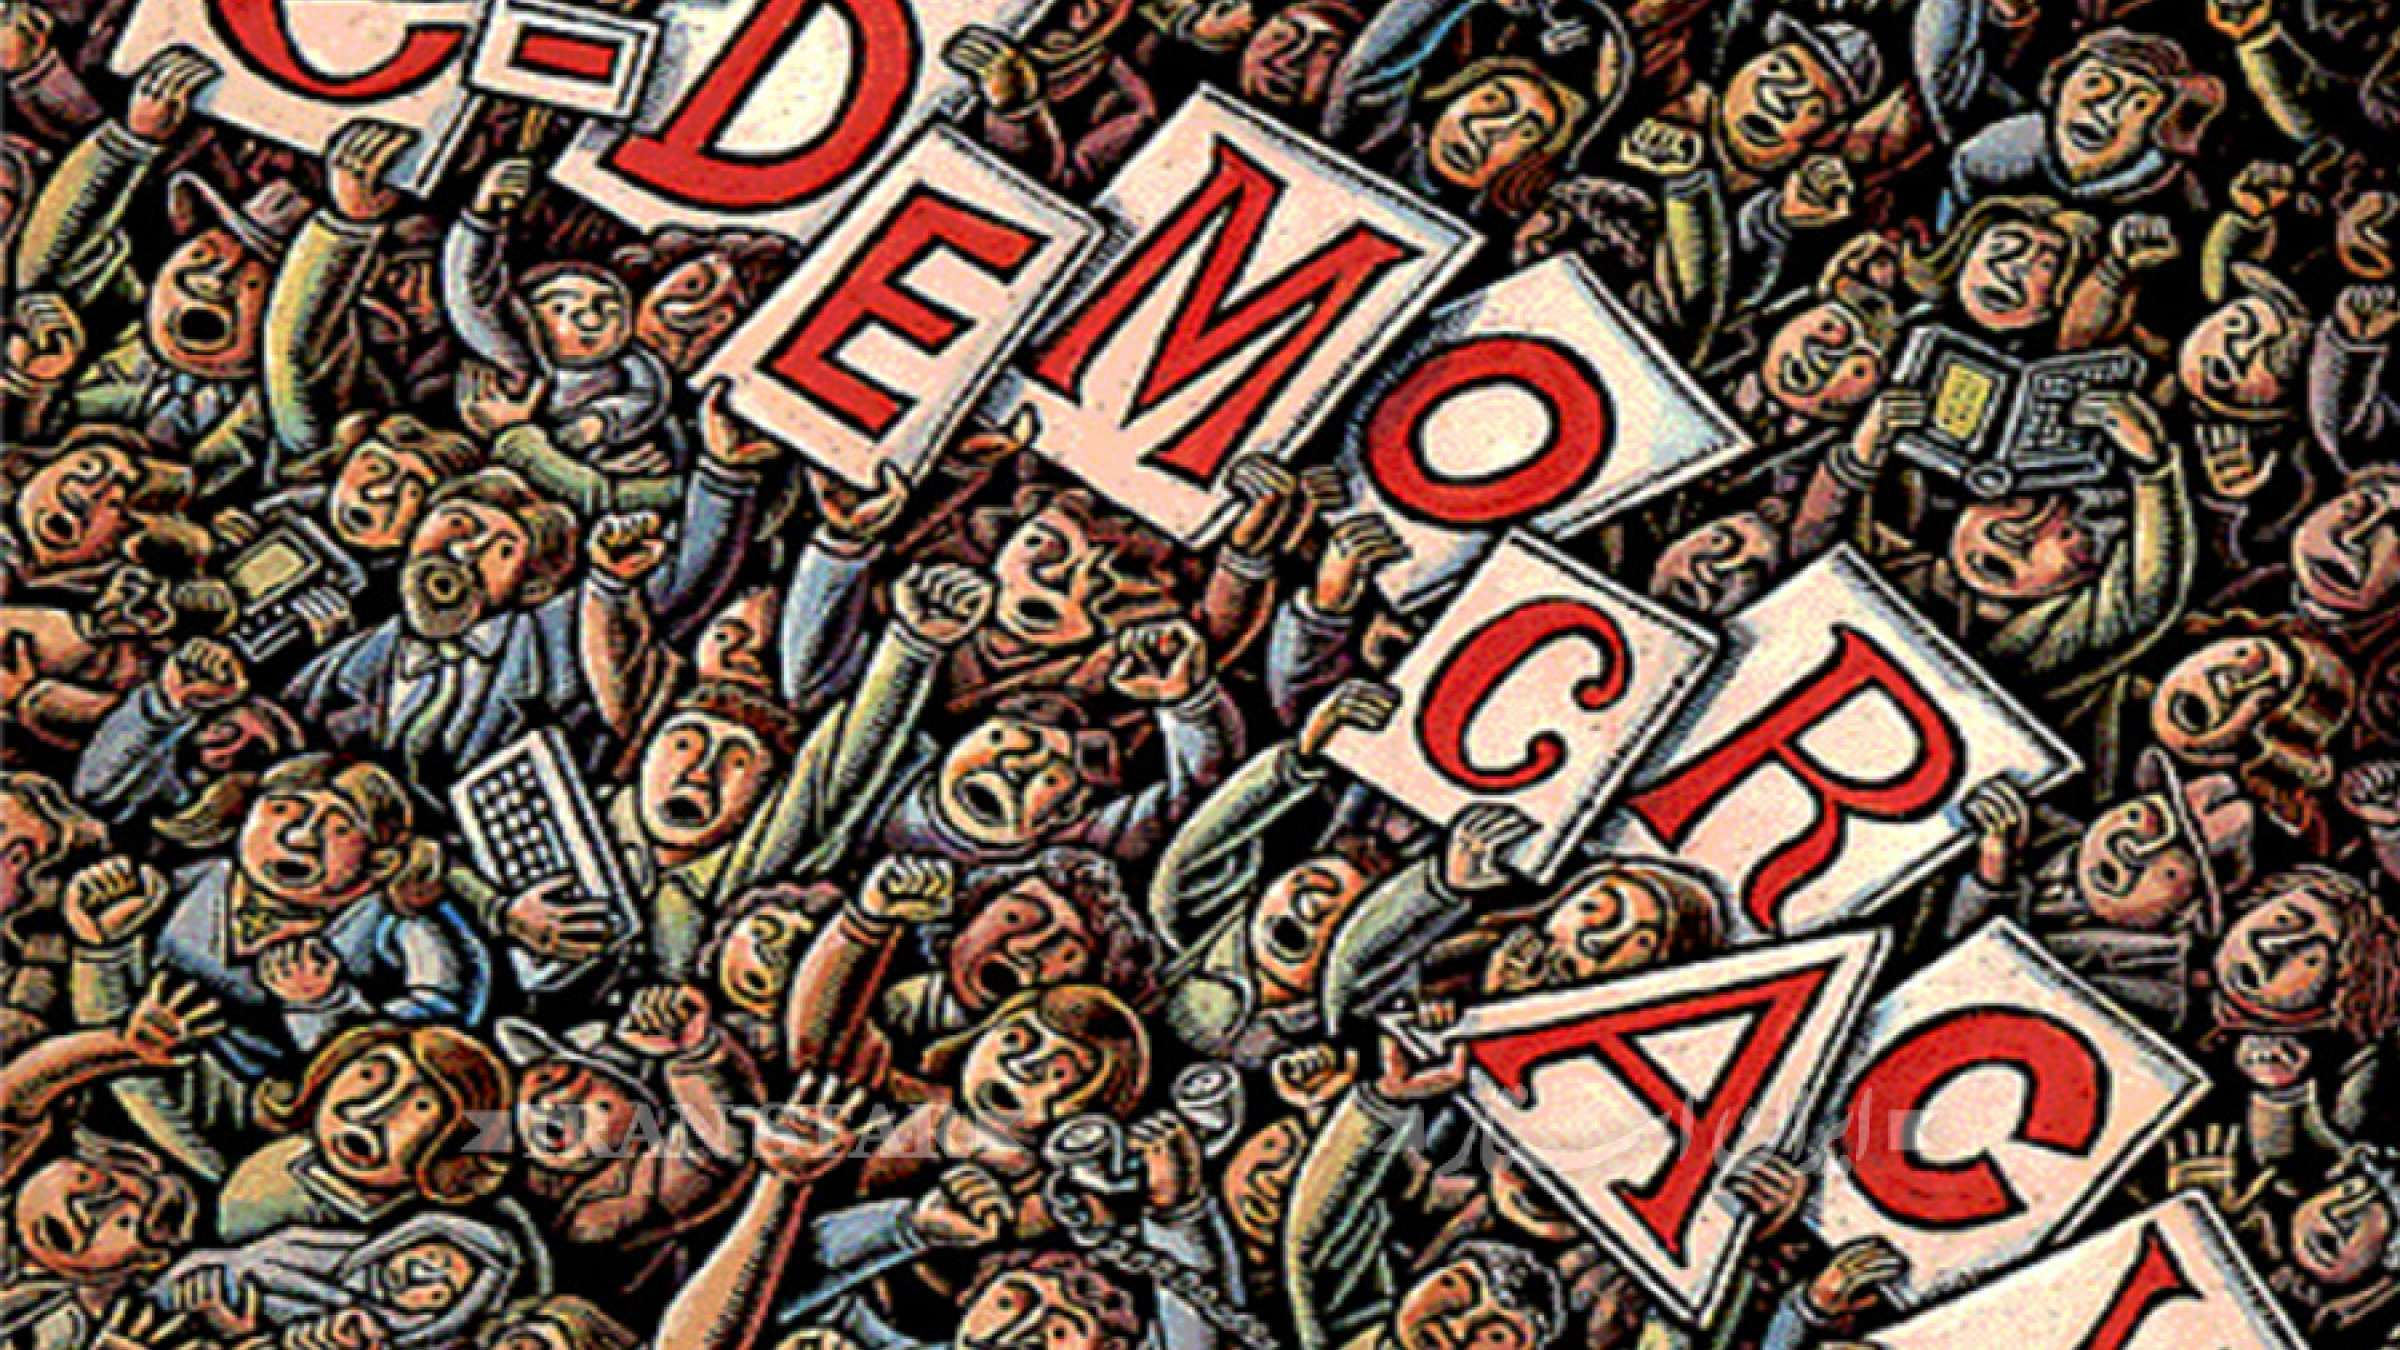 jameye-irani-adame-demokrasi